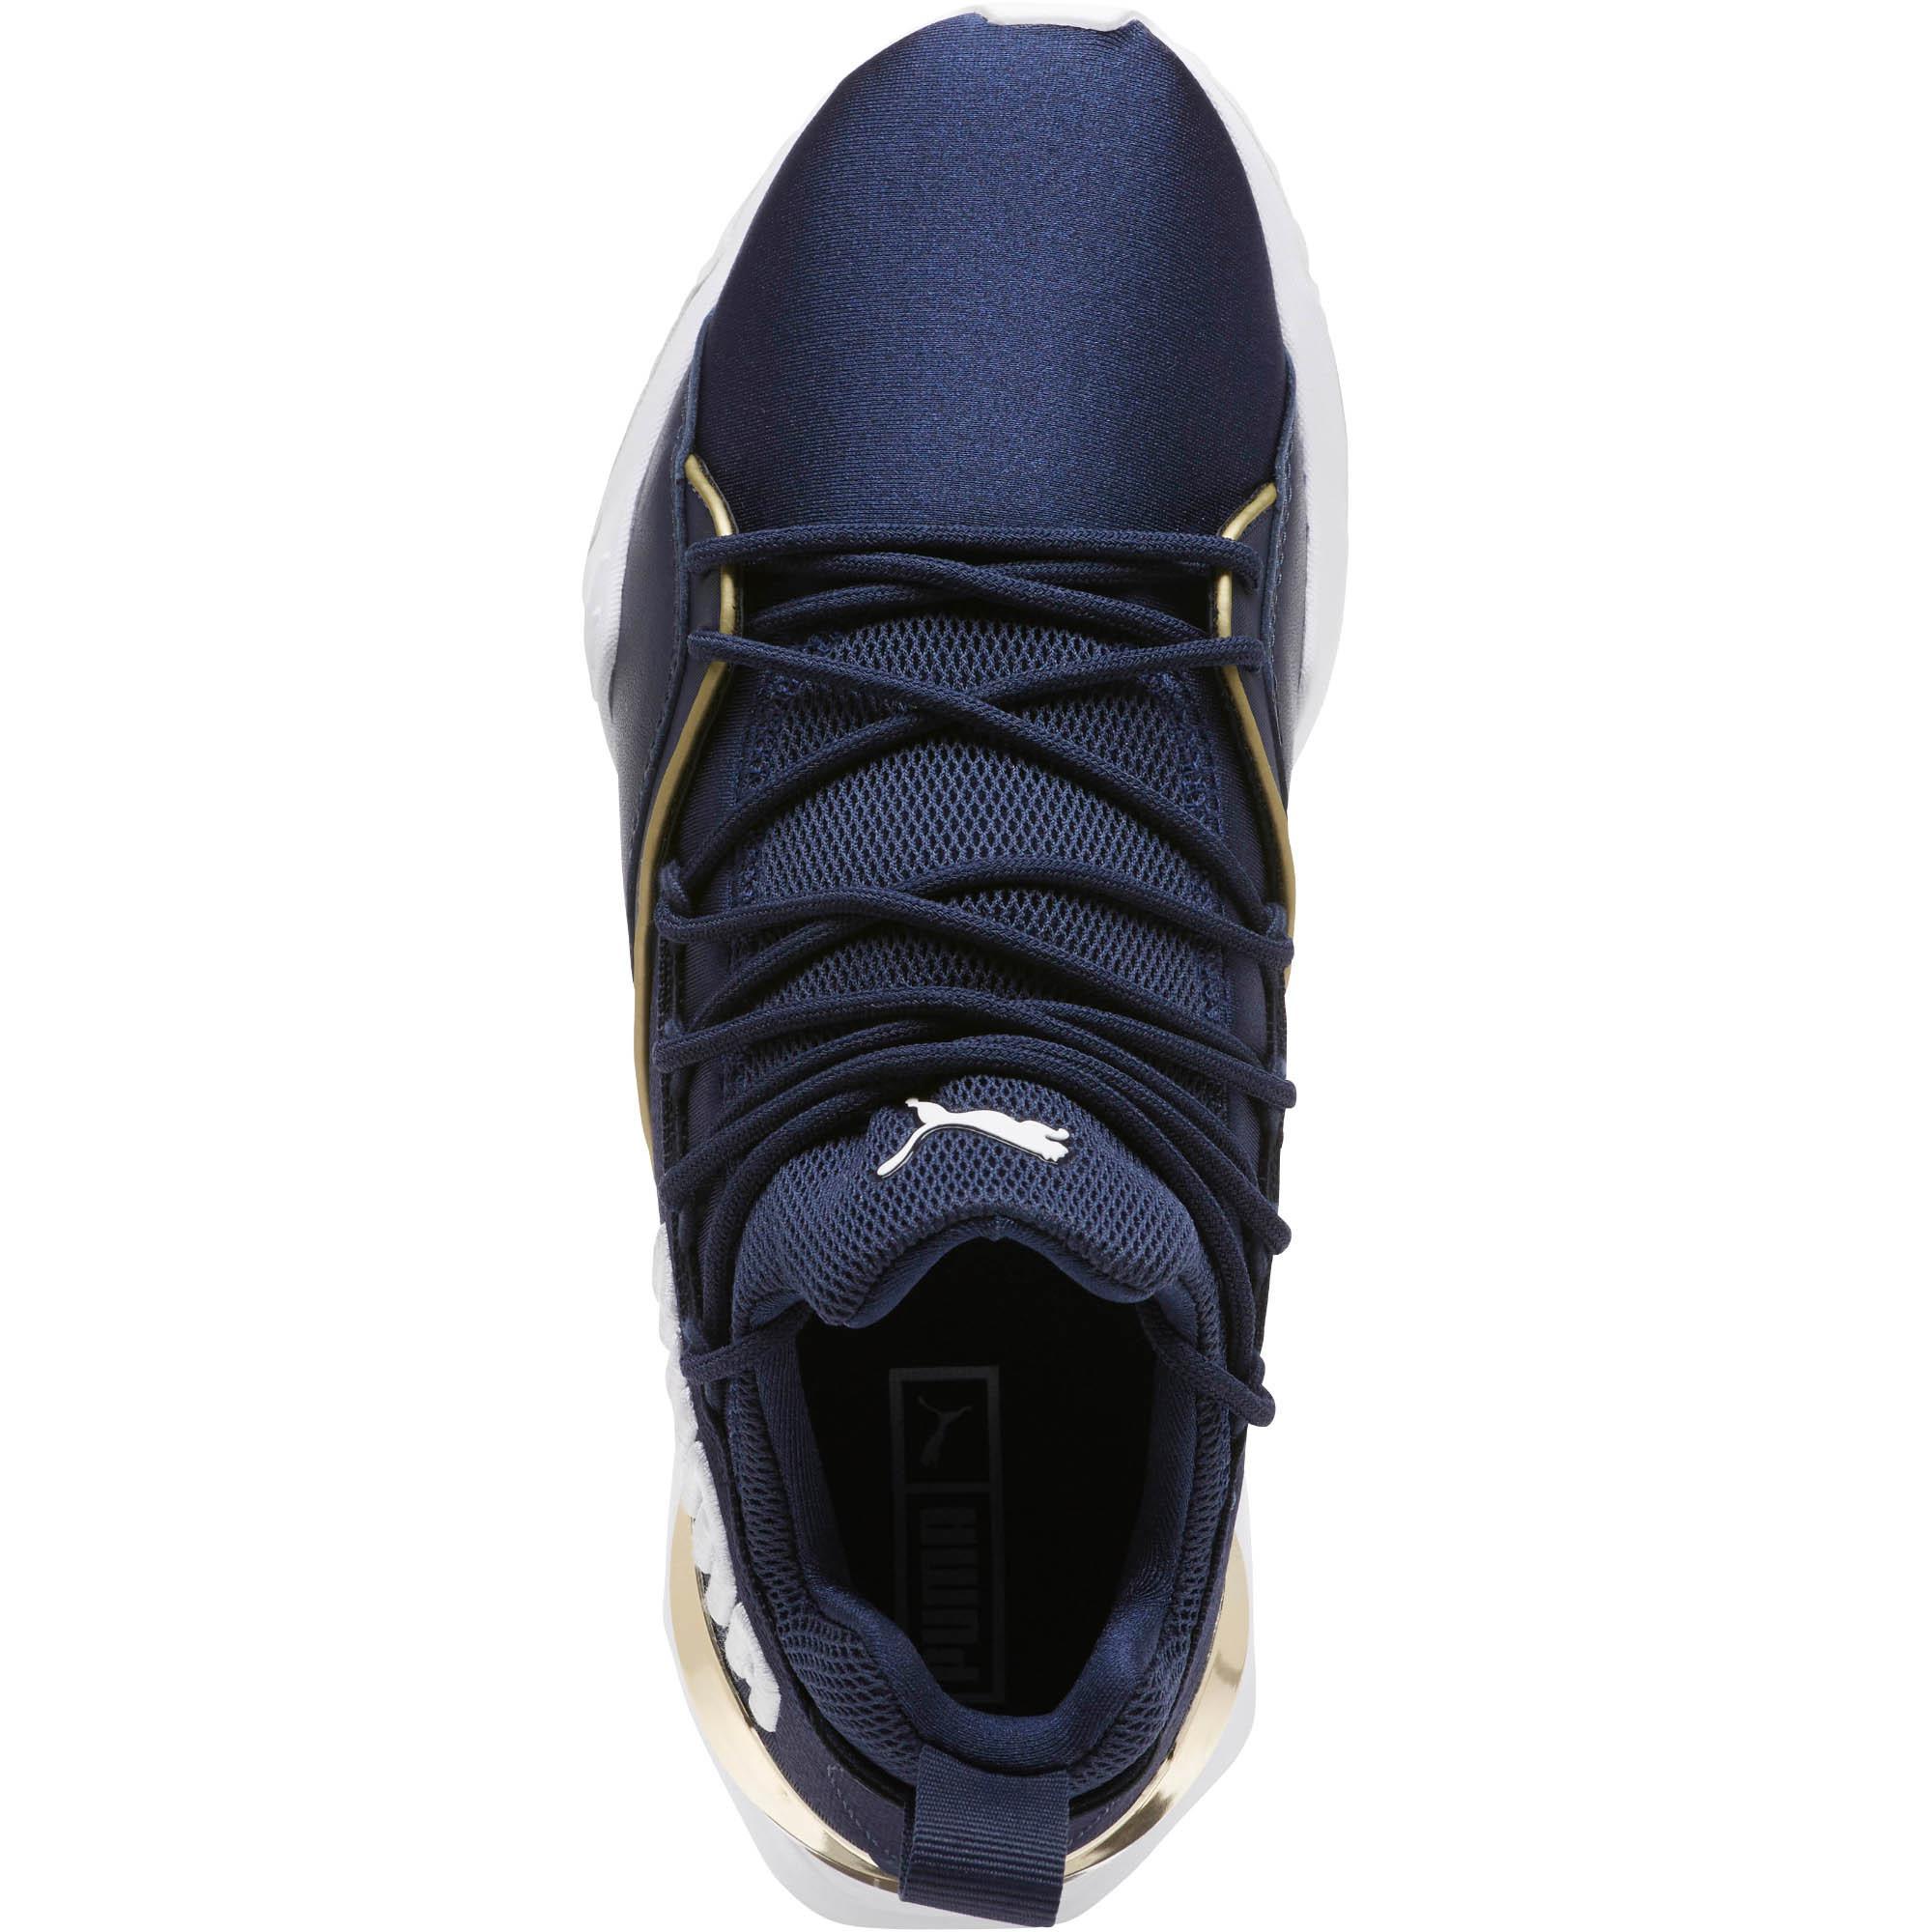 6cf95f3233d Lyst - PUMA Muse Maia Varsity Women s Sneakers in Blue